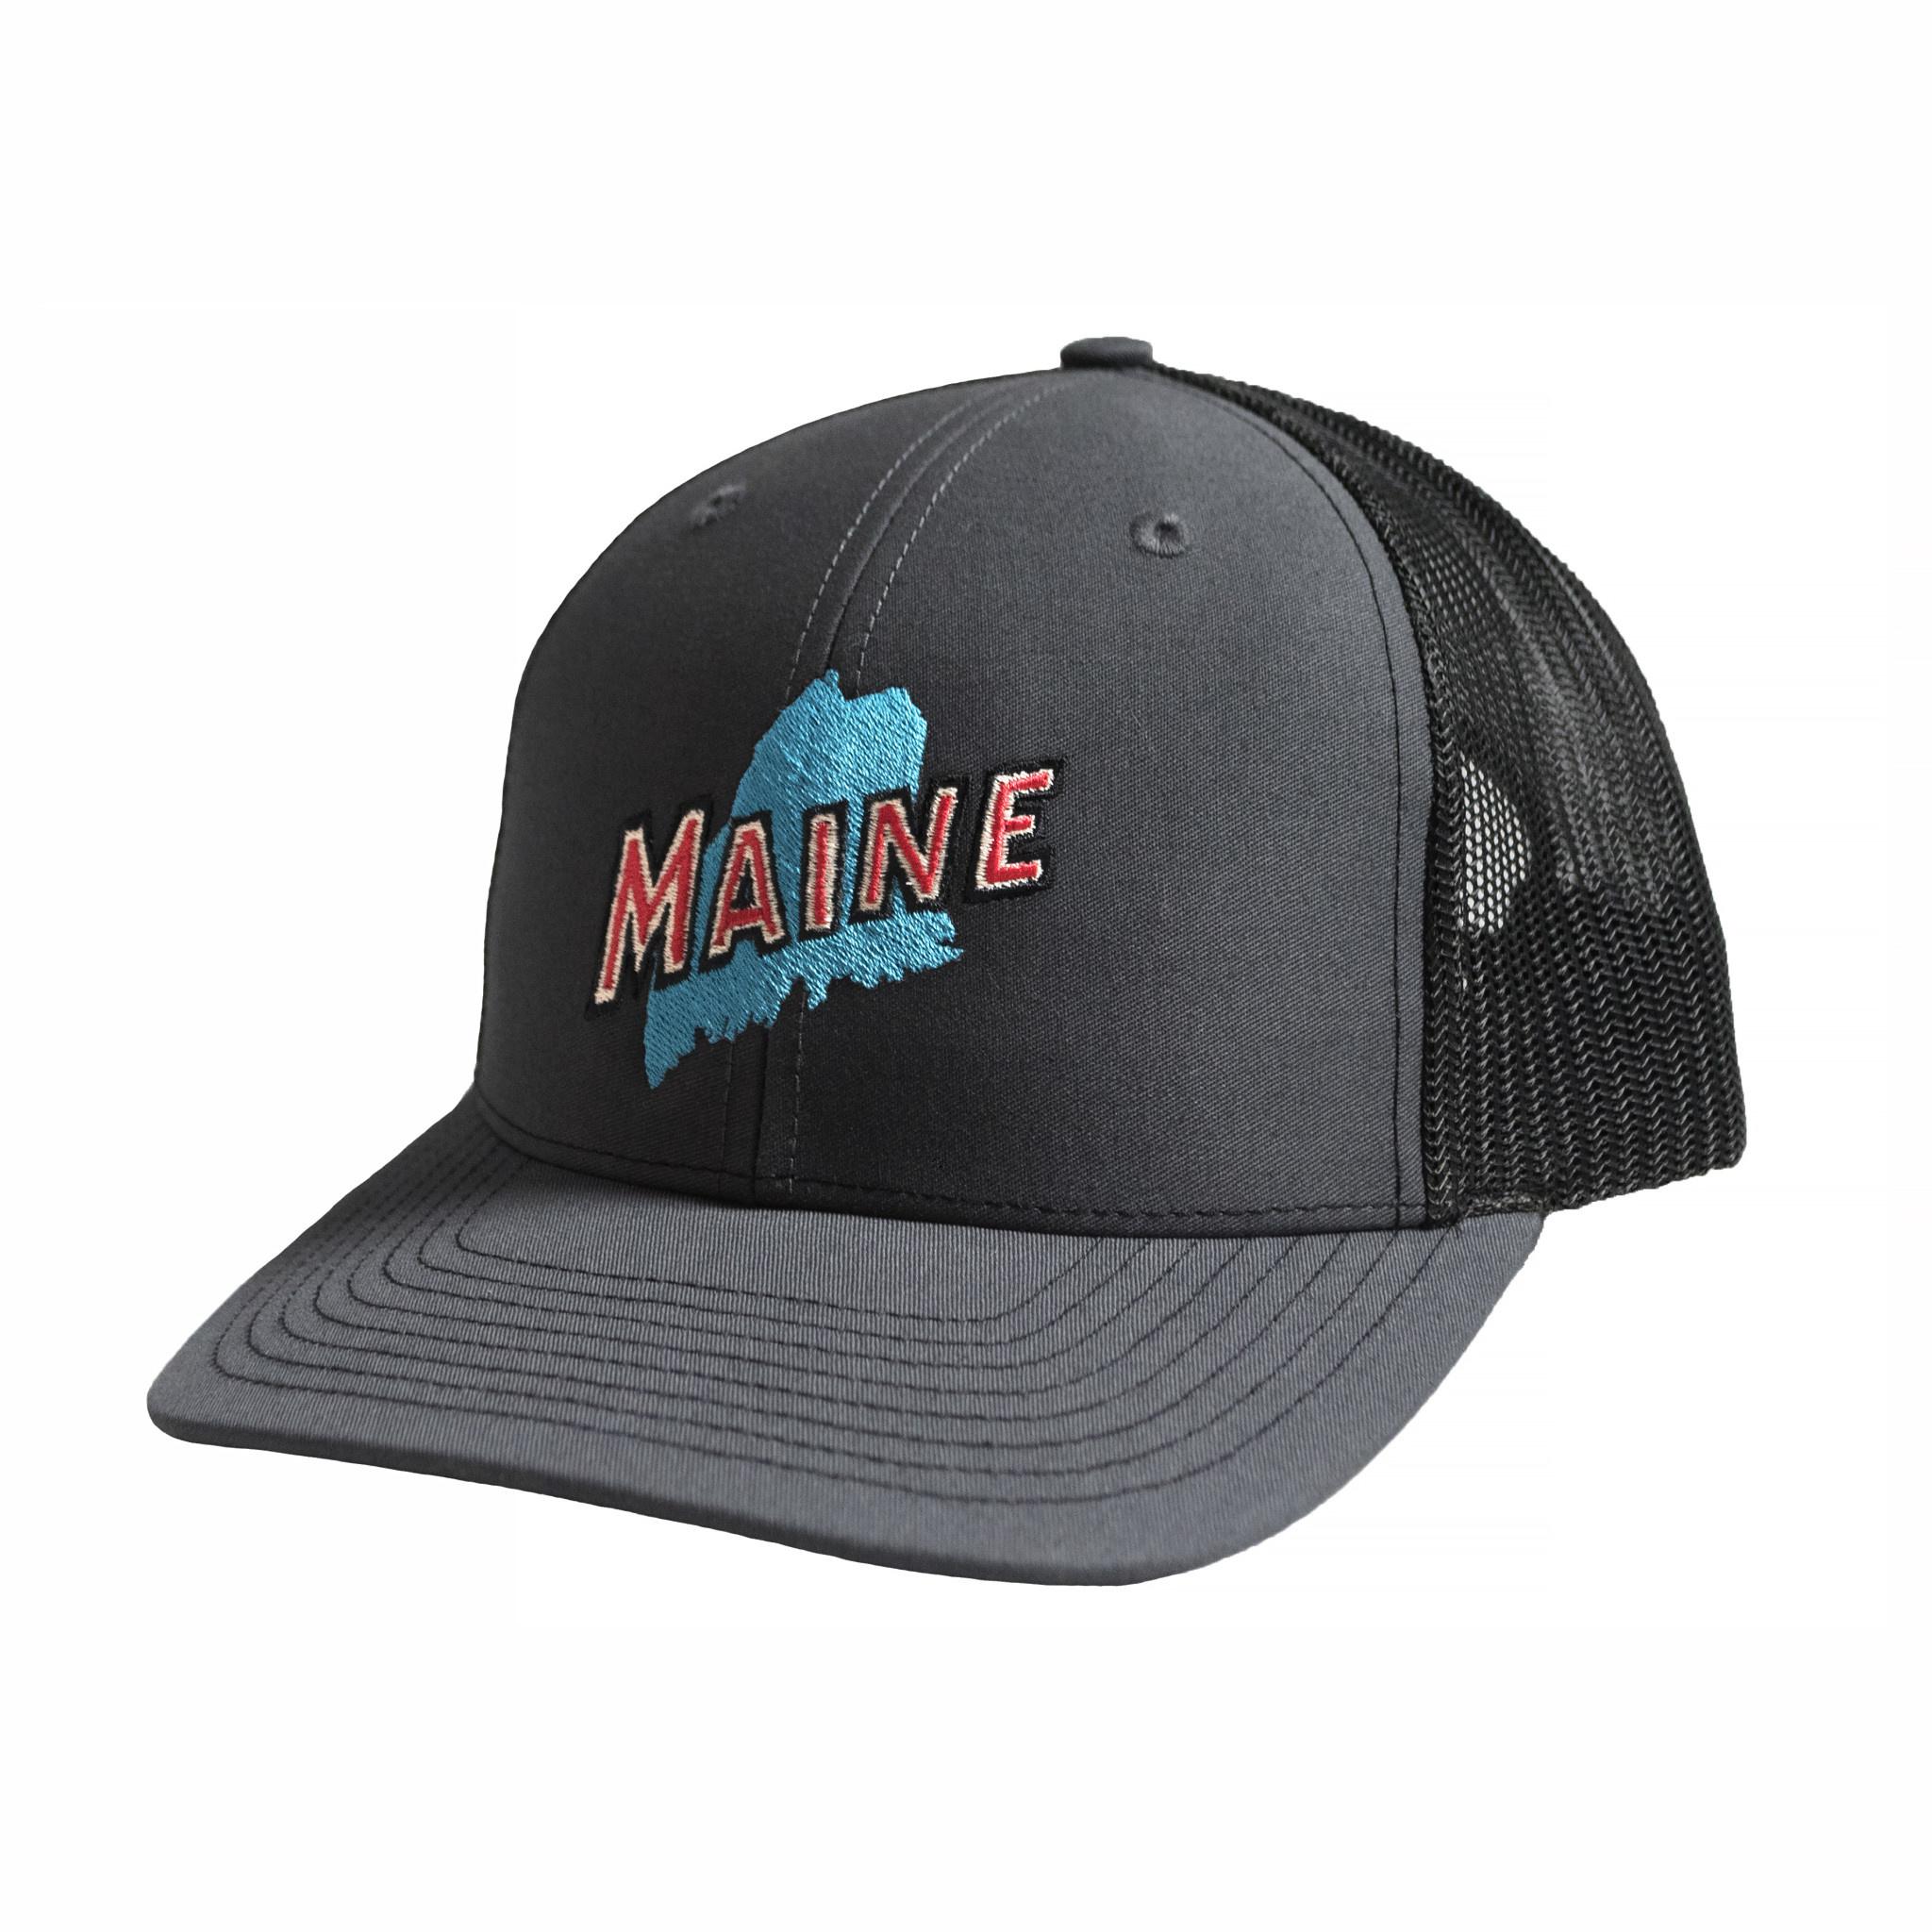 Daytrip Society Retro Maine Trucker Hat - Charcoal